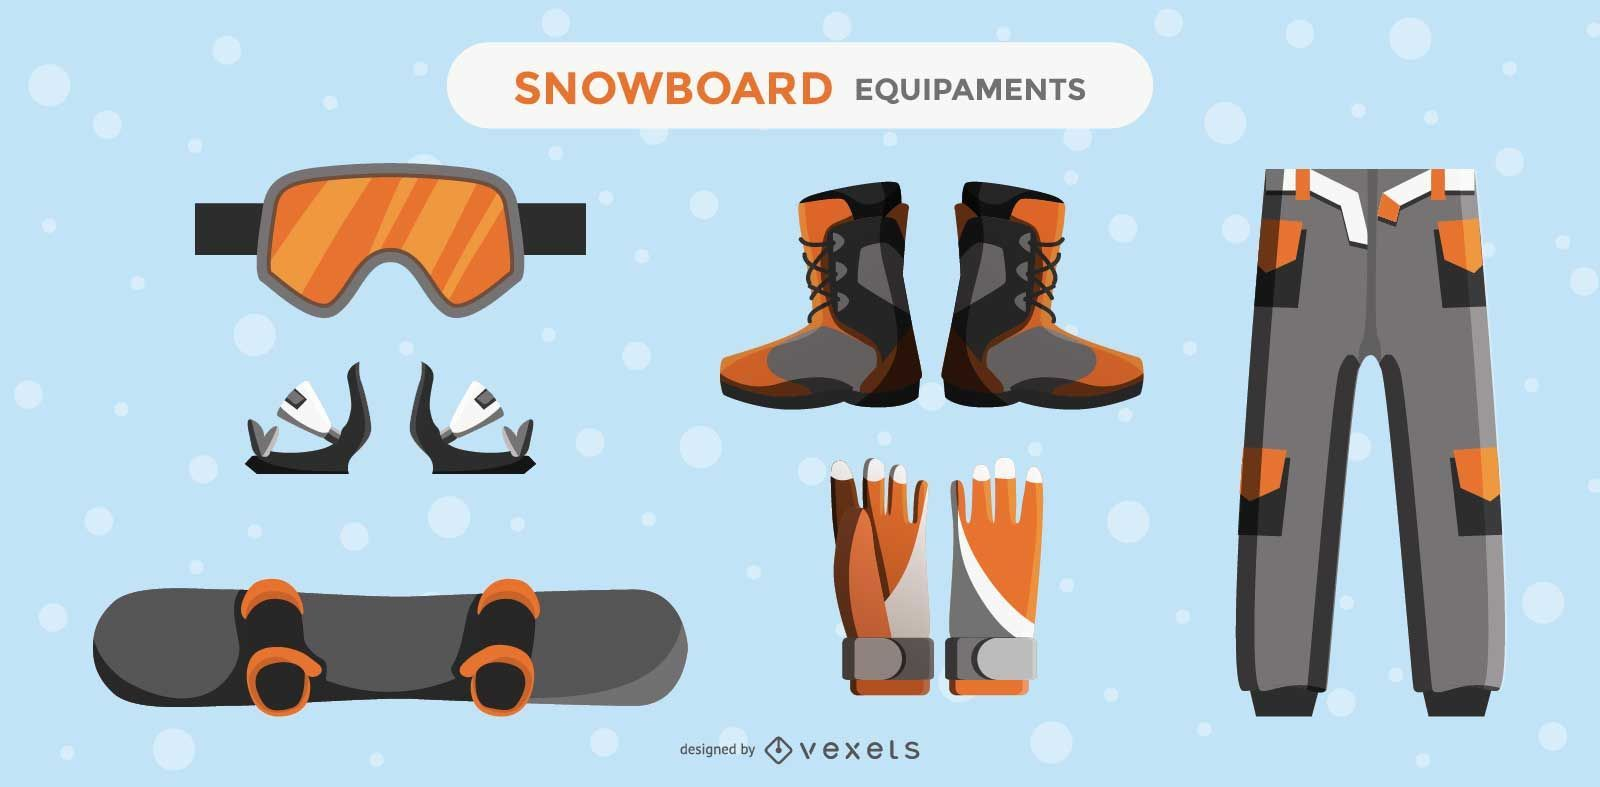 Snowboard equipment design elements set